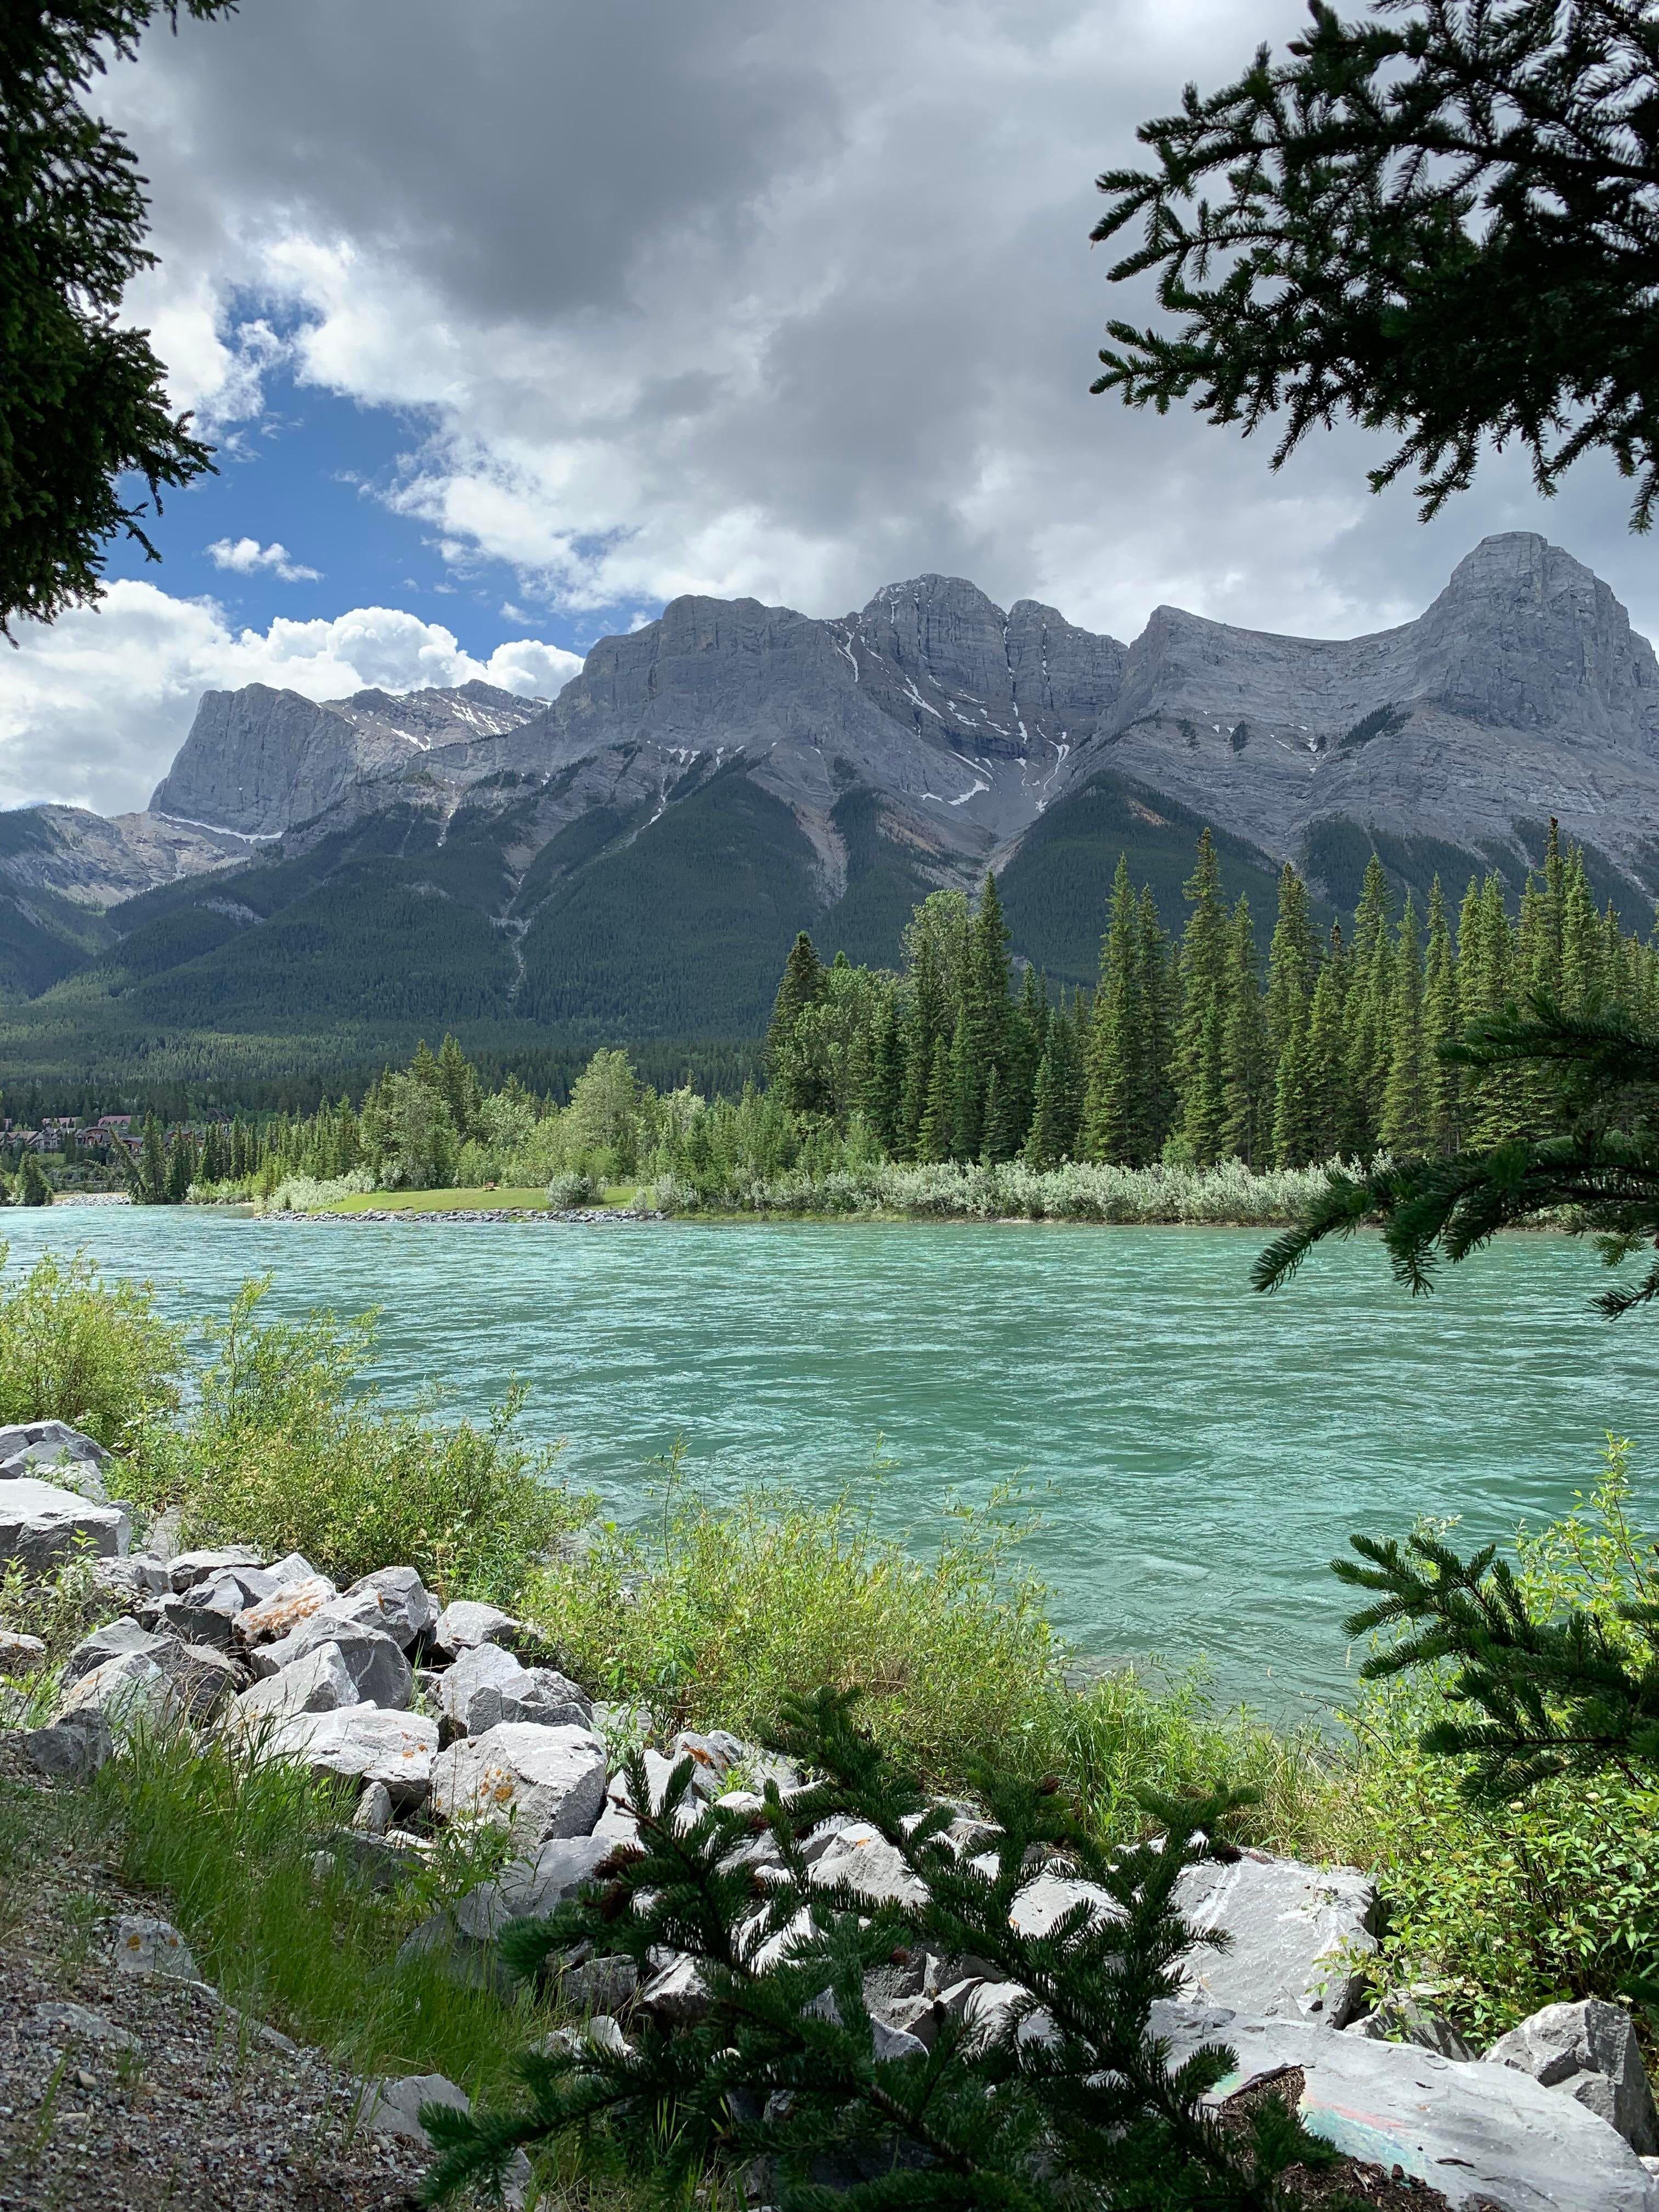 Bow River, Canmore, Alberta, Canada. [OC] (4028x2048